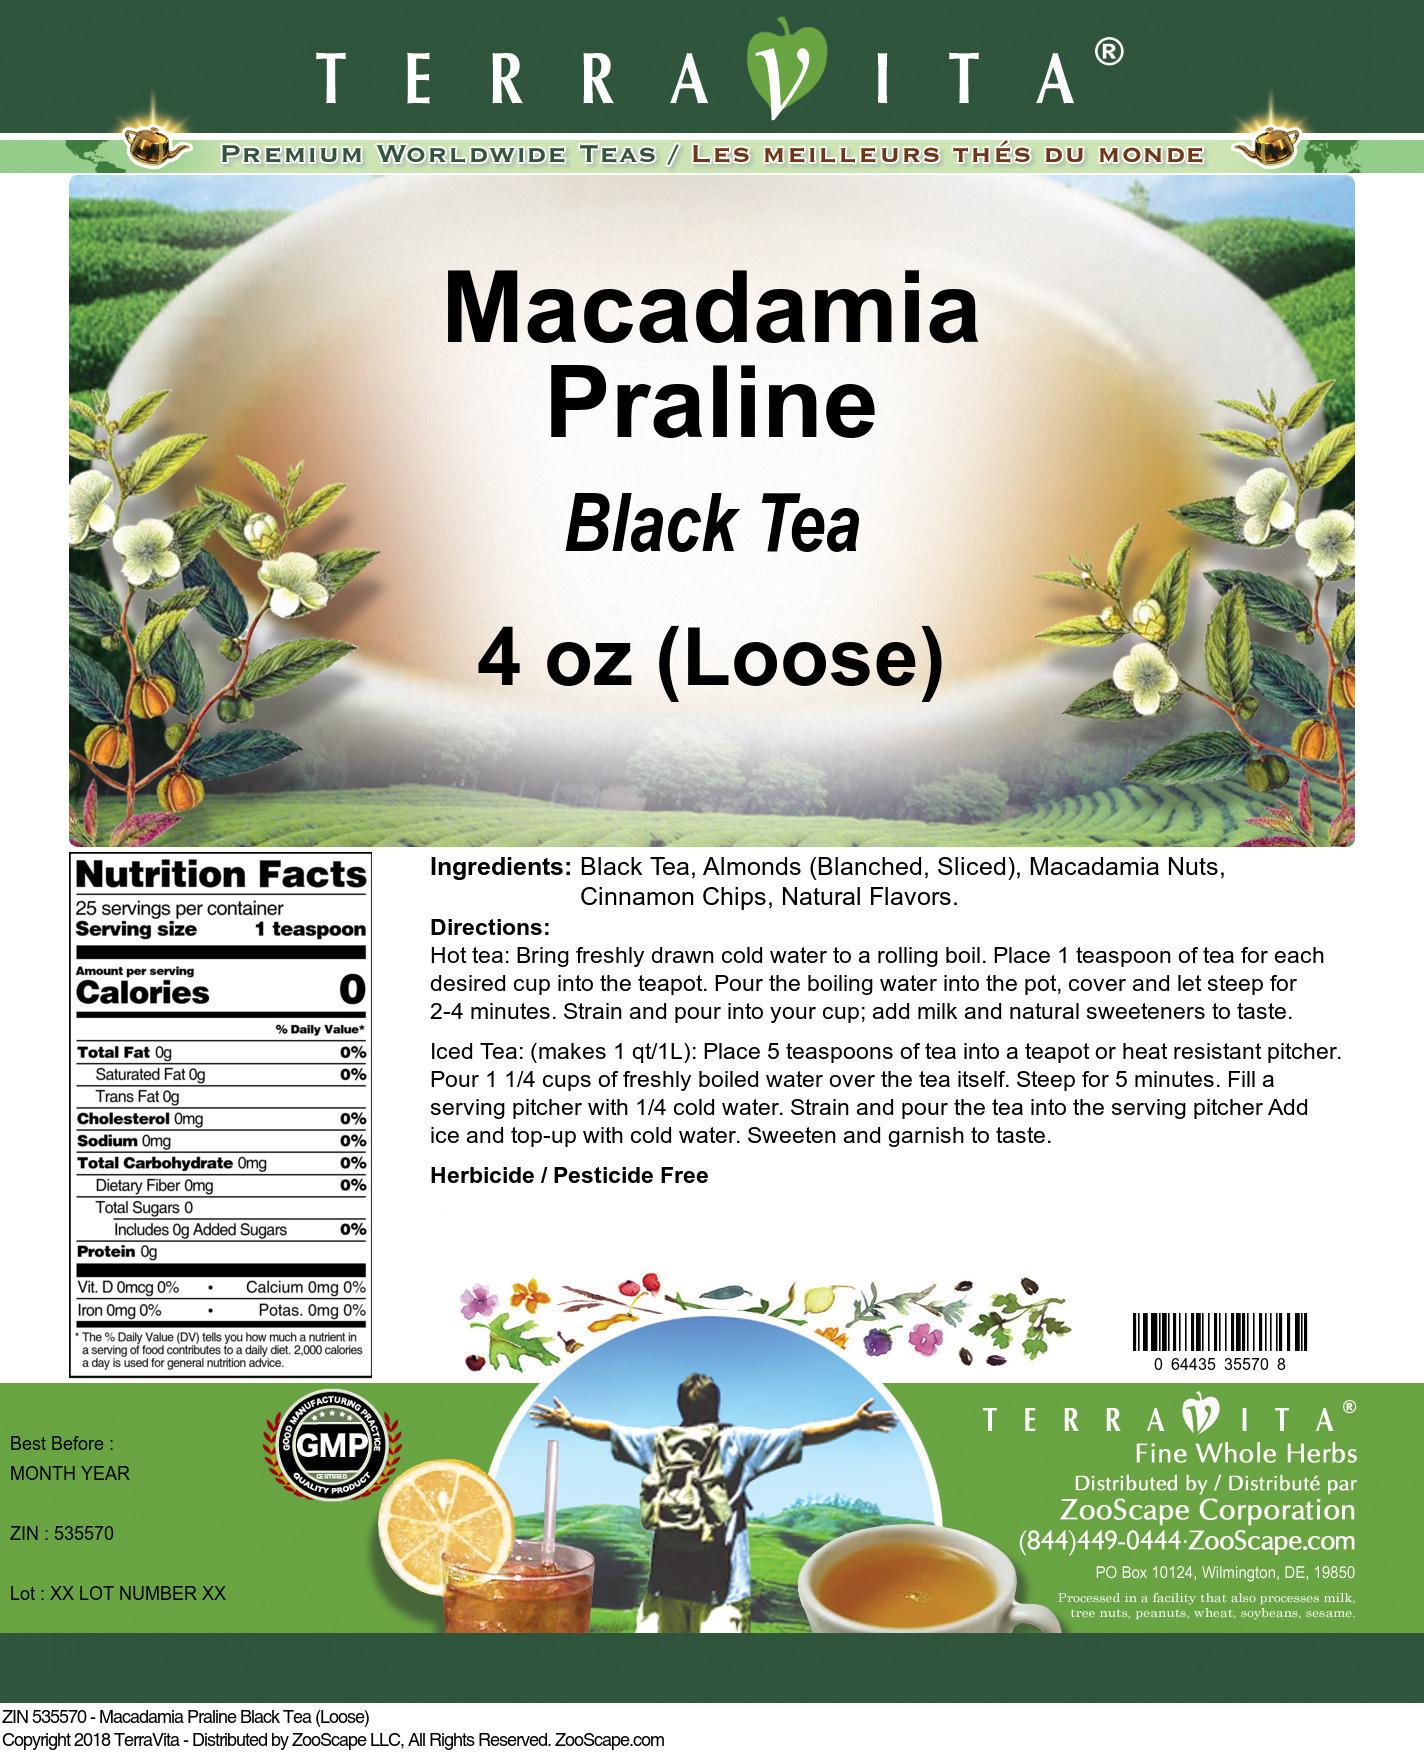 Macadamia Praline Black Tea (Loose)